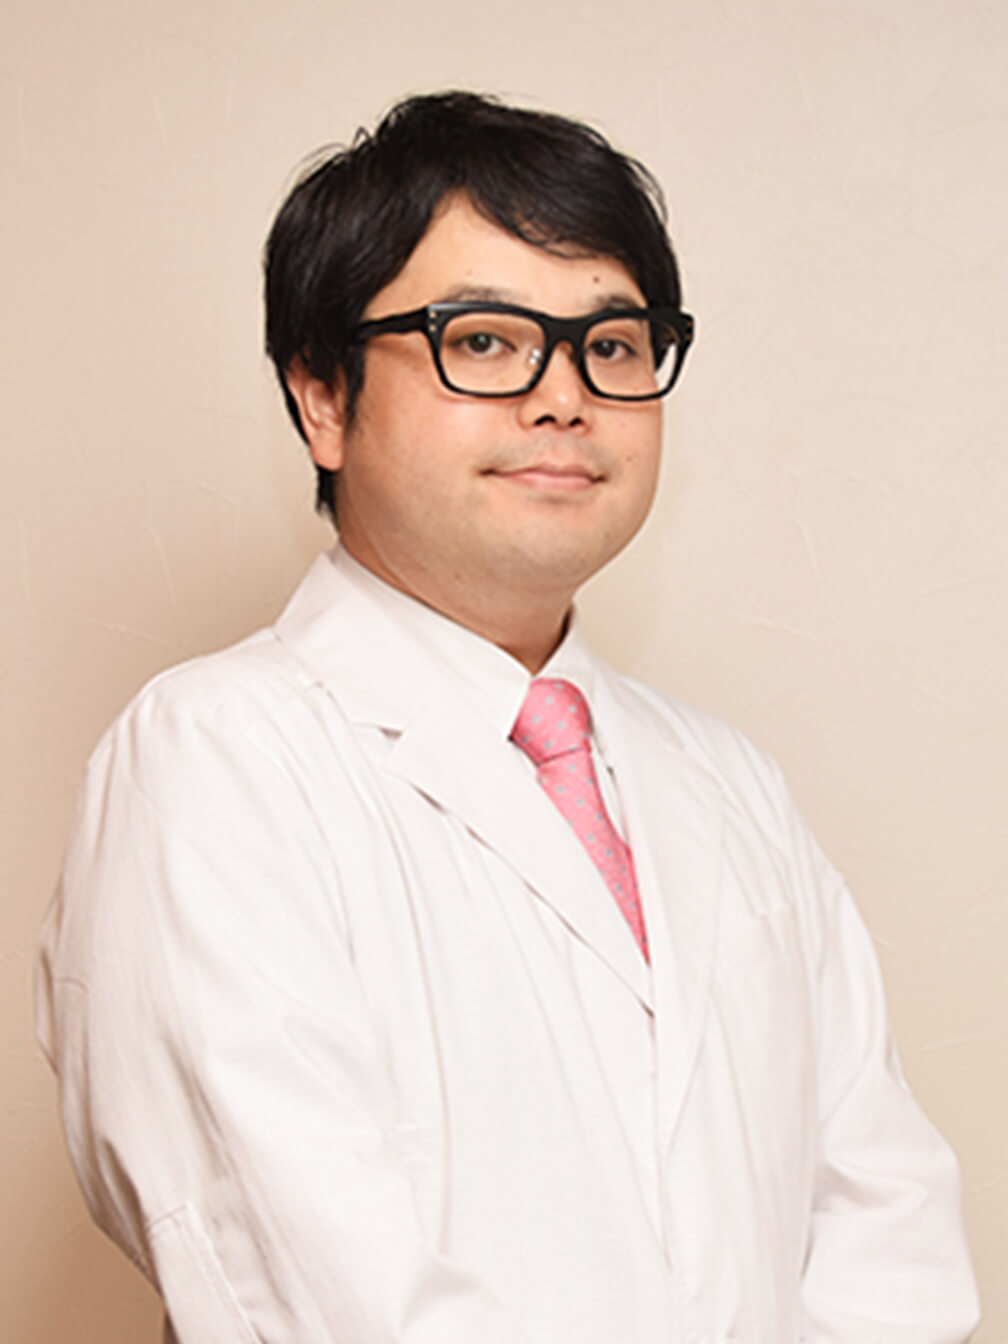 dr_yonezawaclover